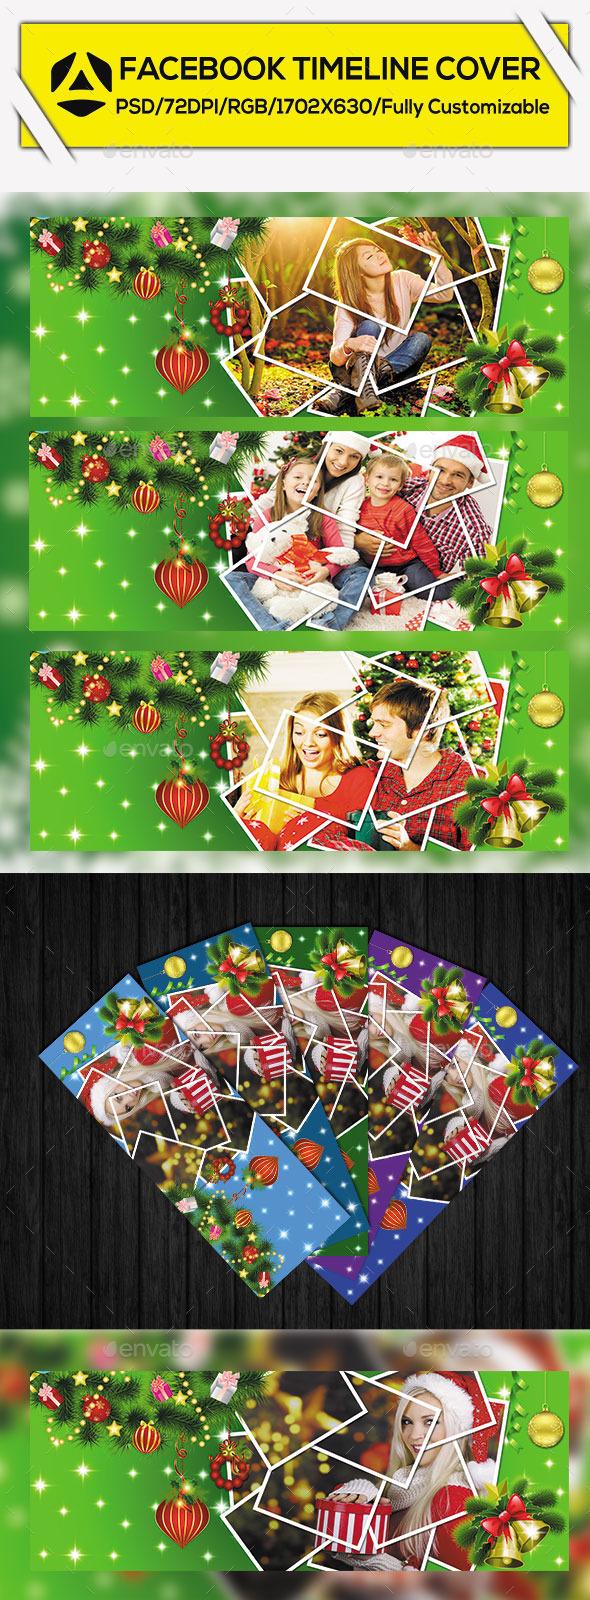 Christmas Facebook Timeline Cover Vol. 2 - Facebook Timeline Covers Social Media